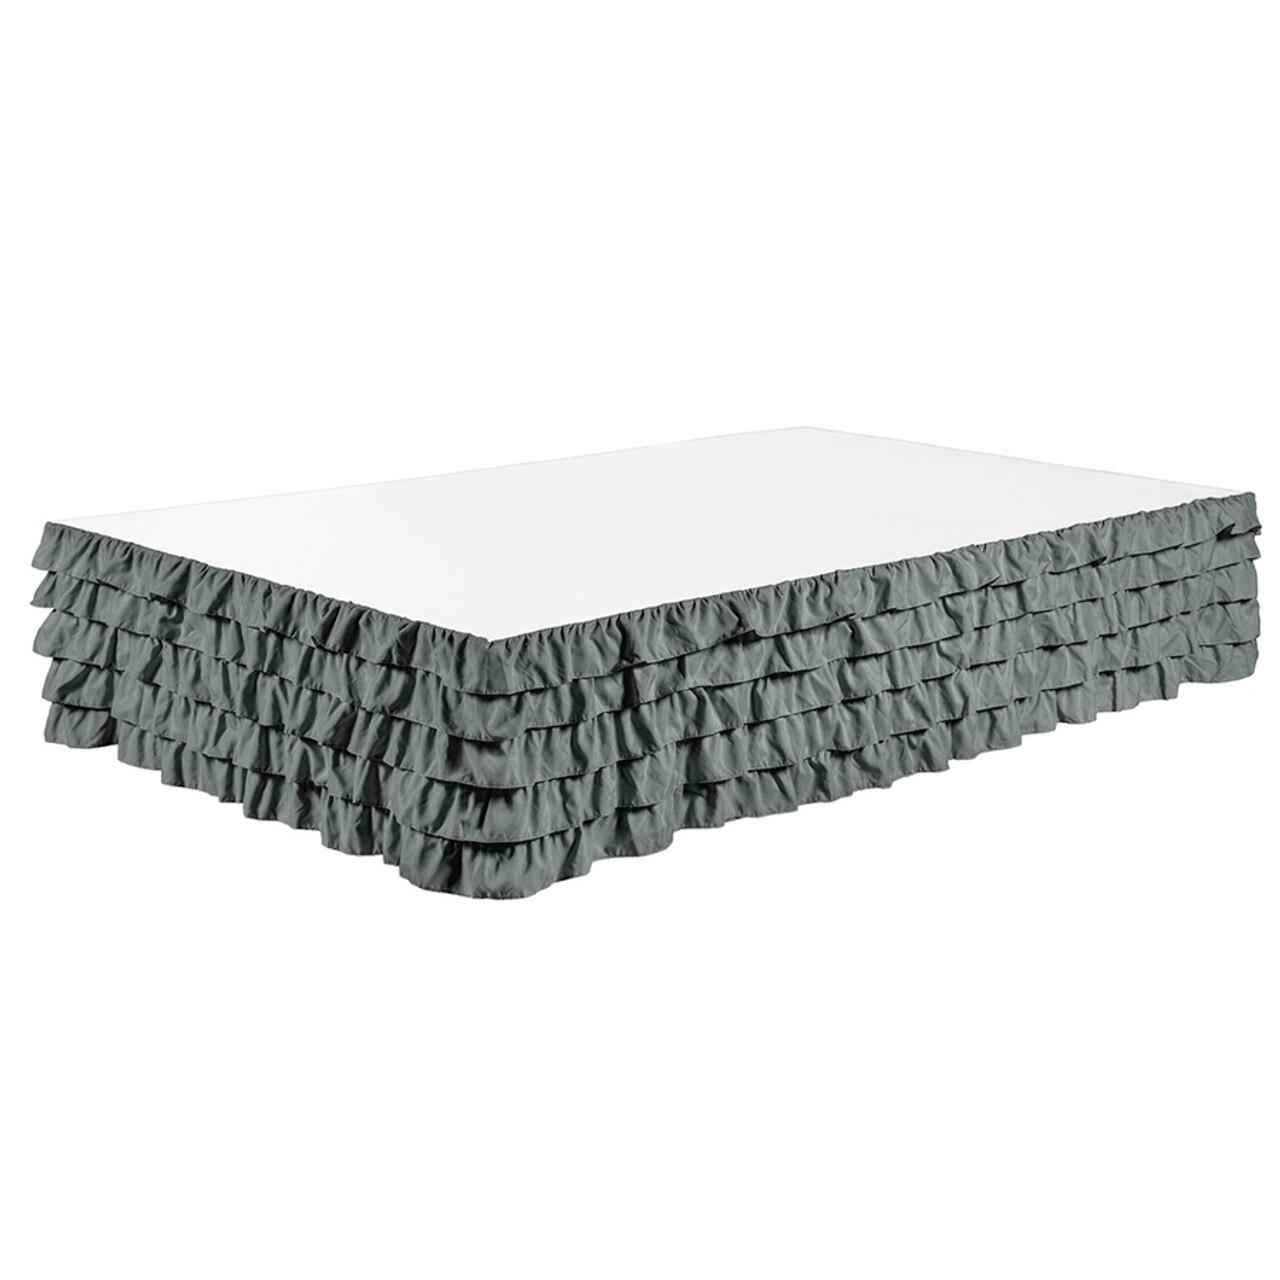 "Gray Bed Skirt Tiered Dust Ruffle 100% Brushed Microfiber with 14"" Drop in USA, California, New York, New York City, Los Angeles, San Francisco, Pennsylvania, Washington DC, Virginia, Maryland"